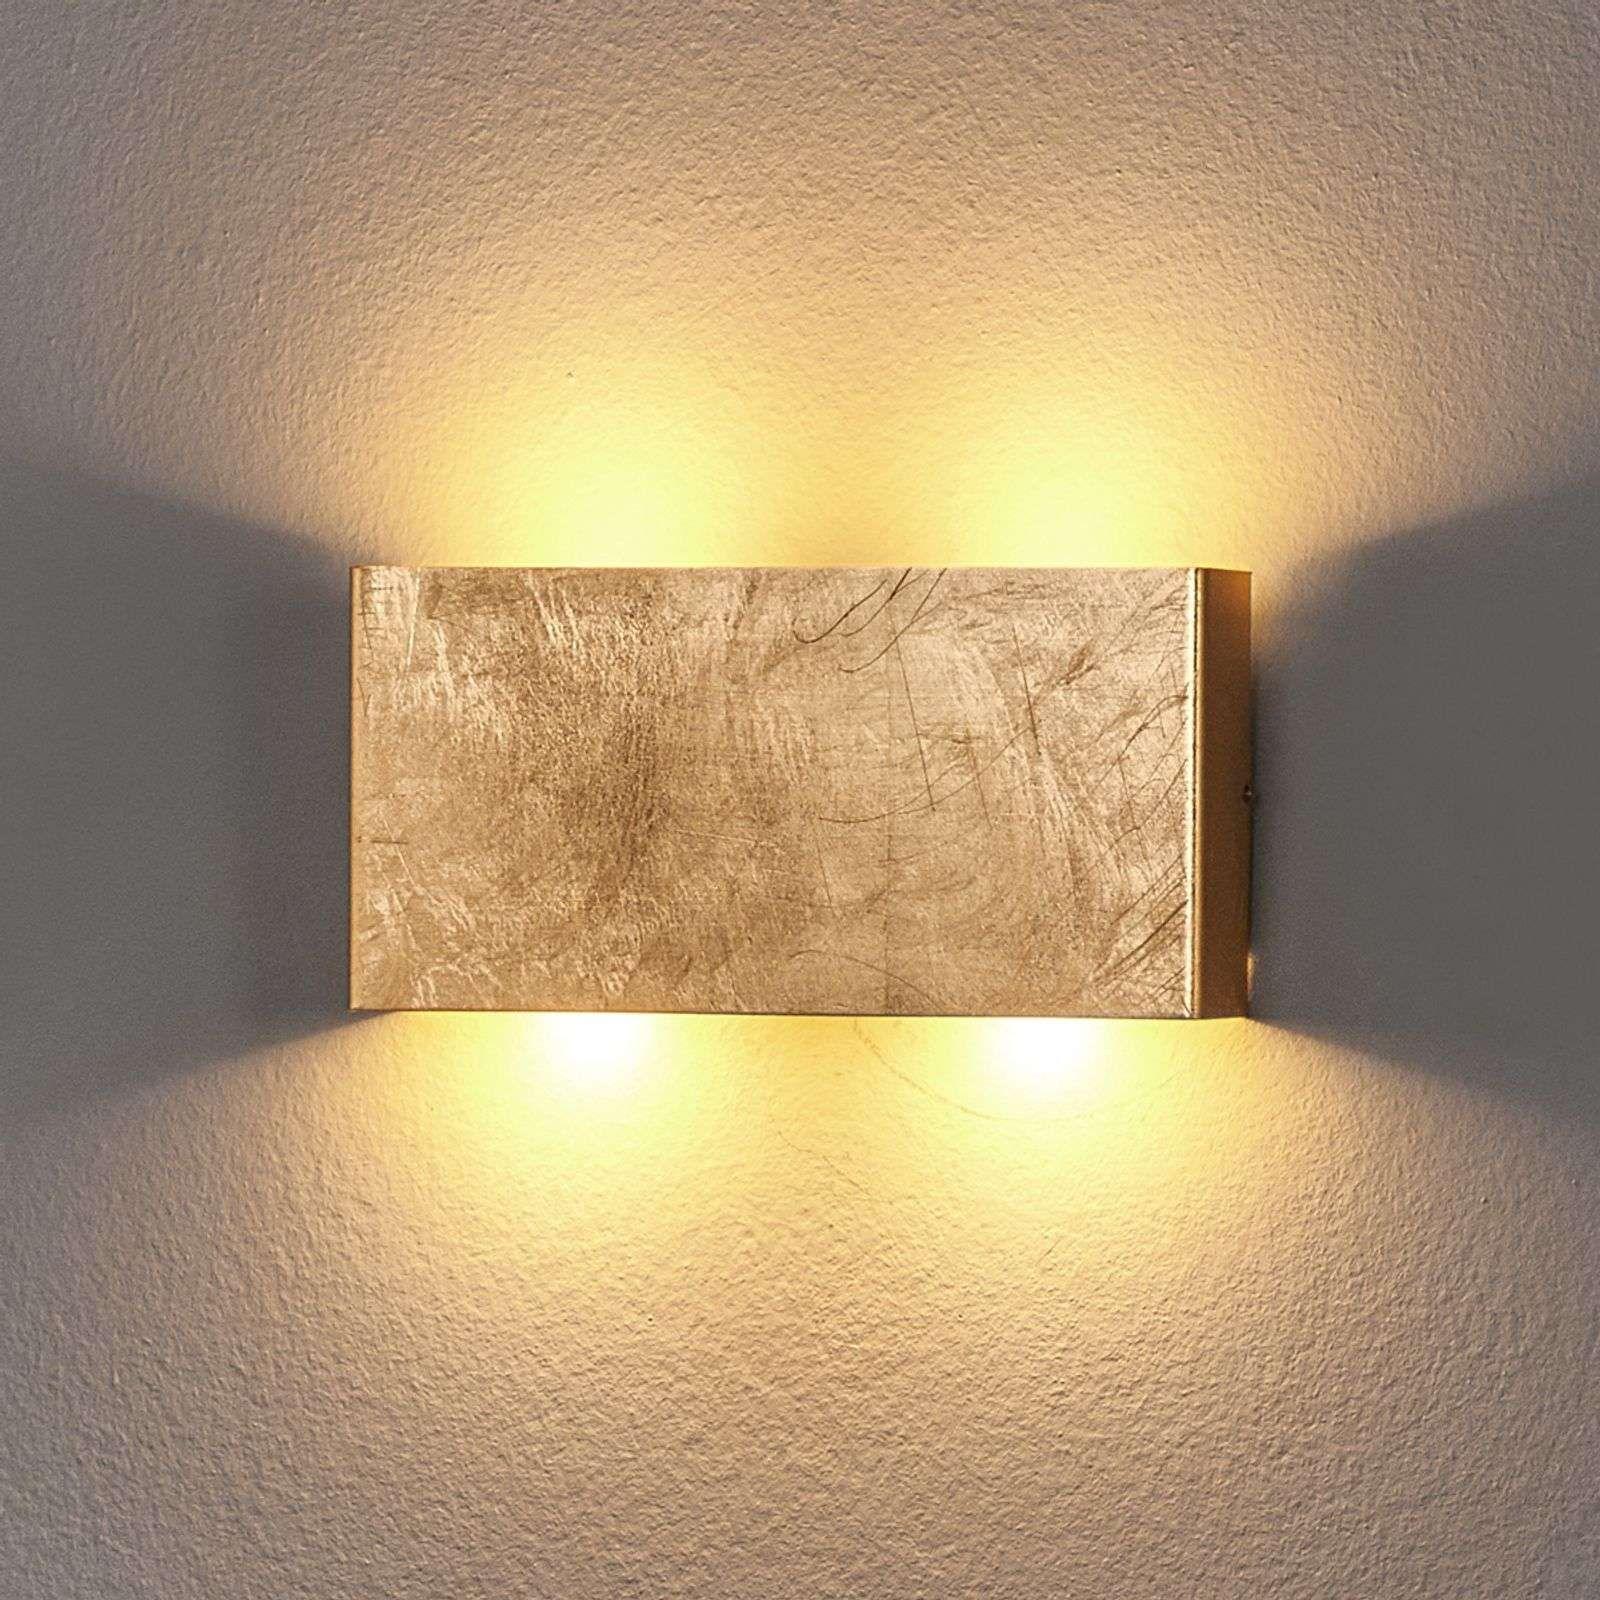 Goldfarbene LED Wandleuchte Maja, dimmbar   Wandleuchte, Led